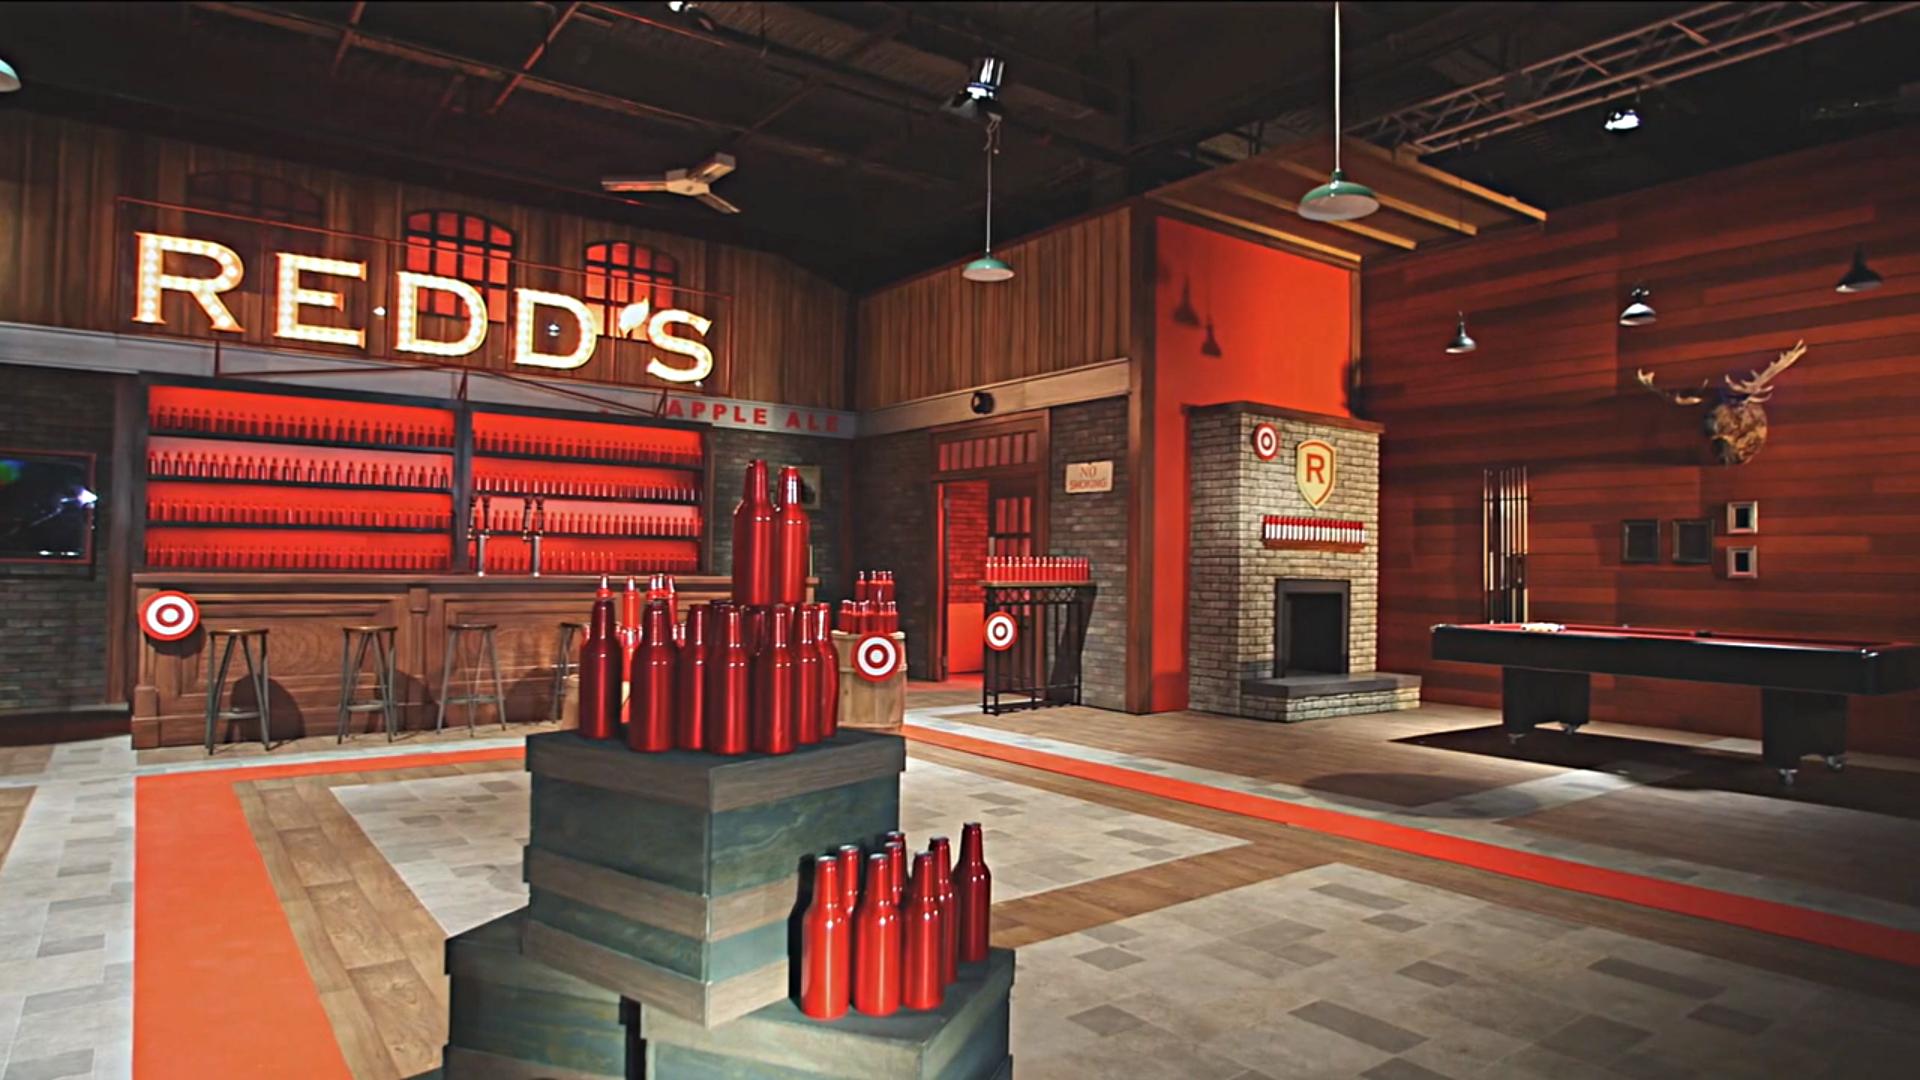 Redd's Apple Ale Promotion